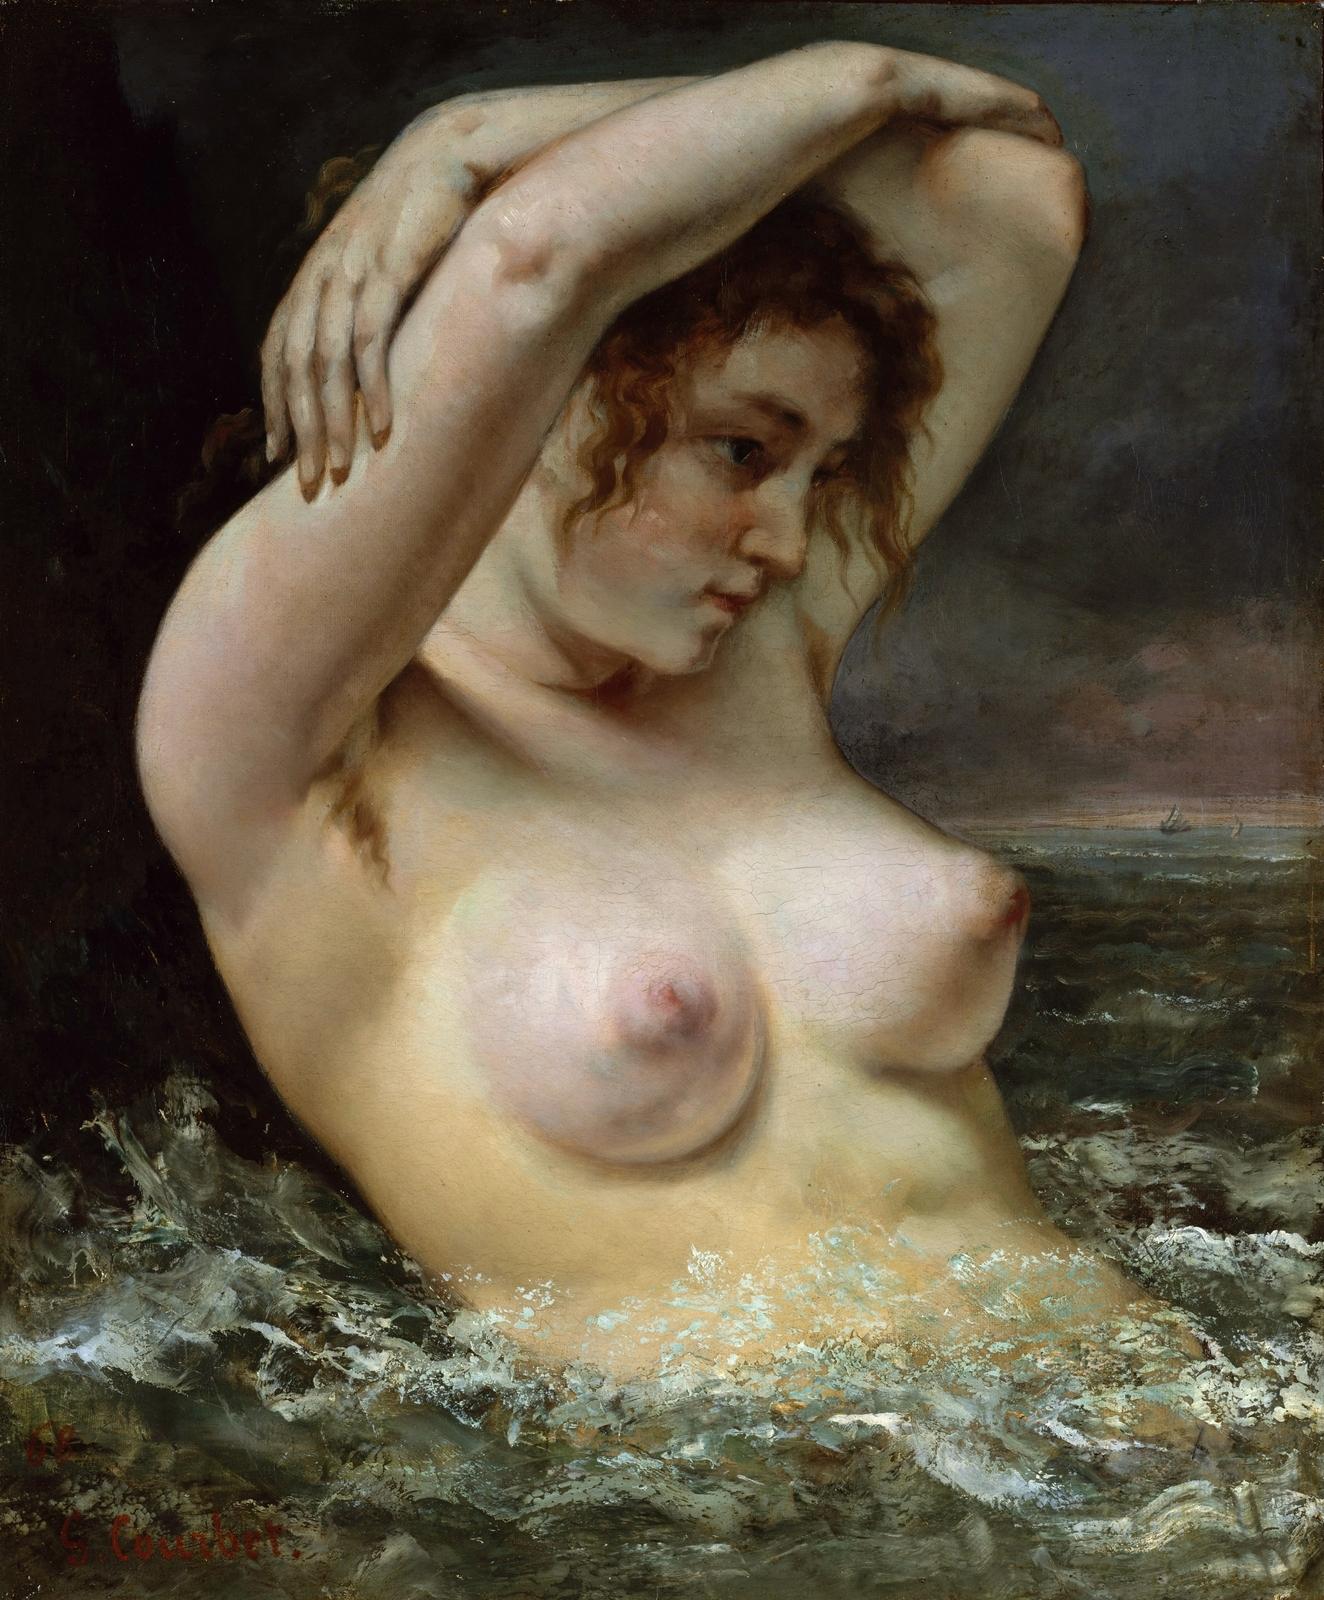 Гюстав Курбе. 1868. Женщина в волнах (The Woman in the Waves). 65.4 х 54. Холст, масло. Нью-Йорк, музей Метрополитен.